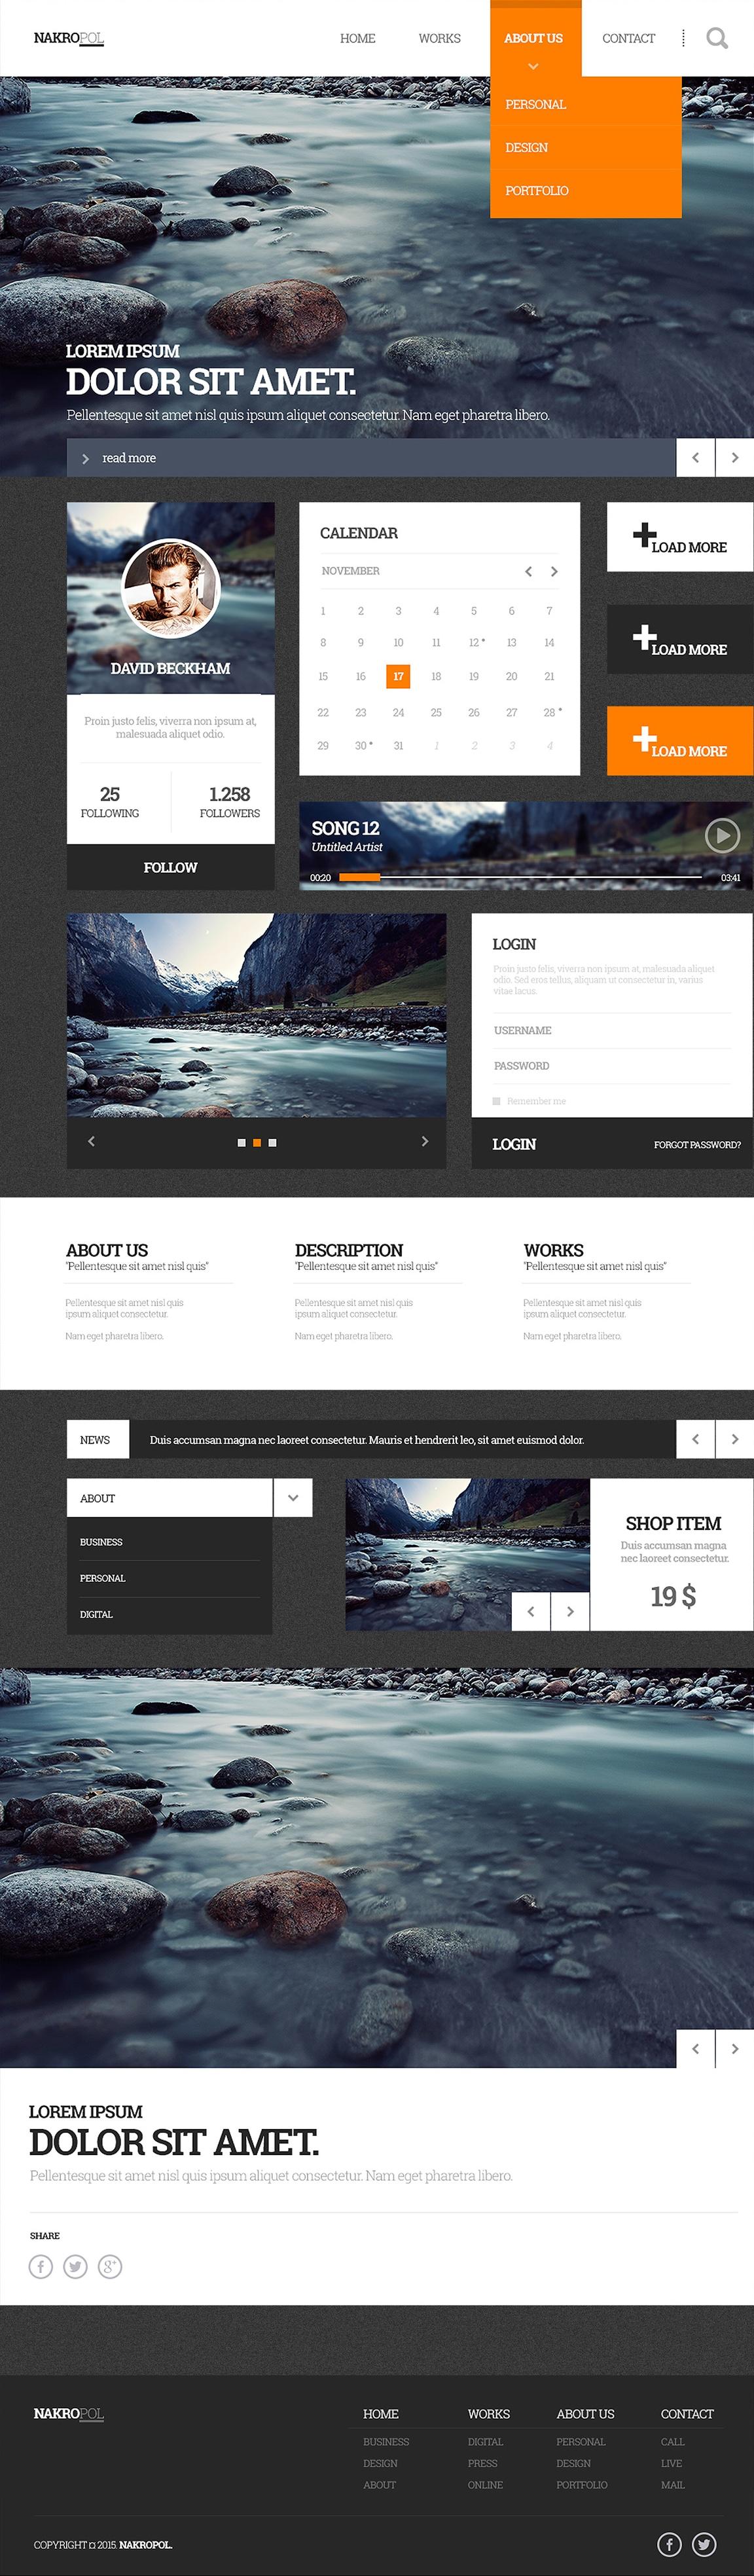 Nakropol - Free Web UI Kit PSD